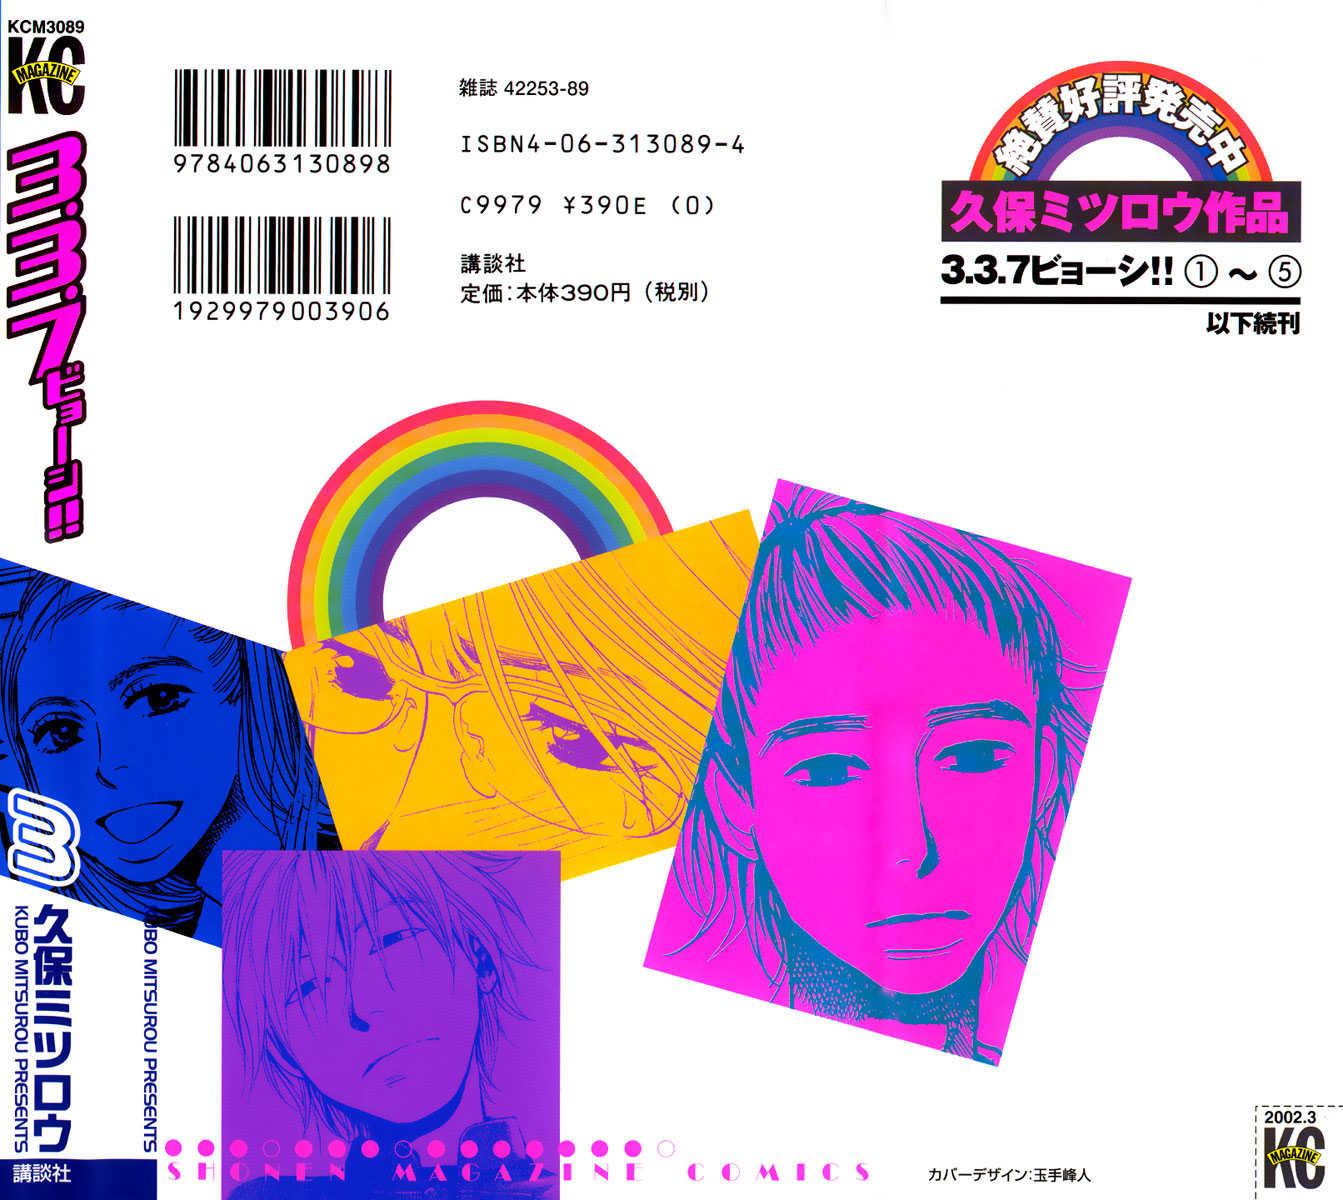 3.3.7 Byooshi 15 Page 2